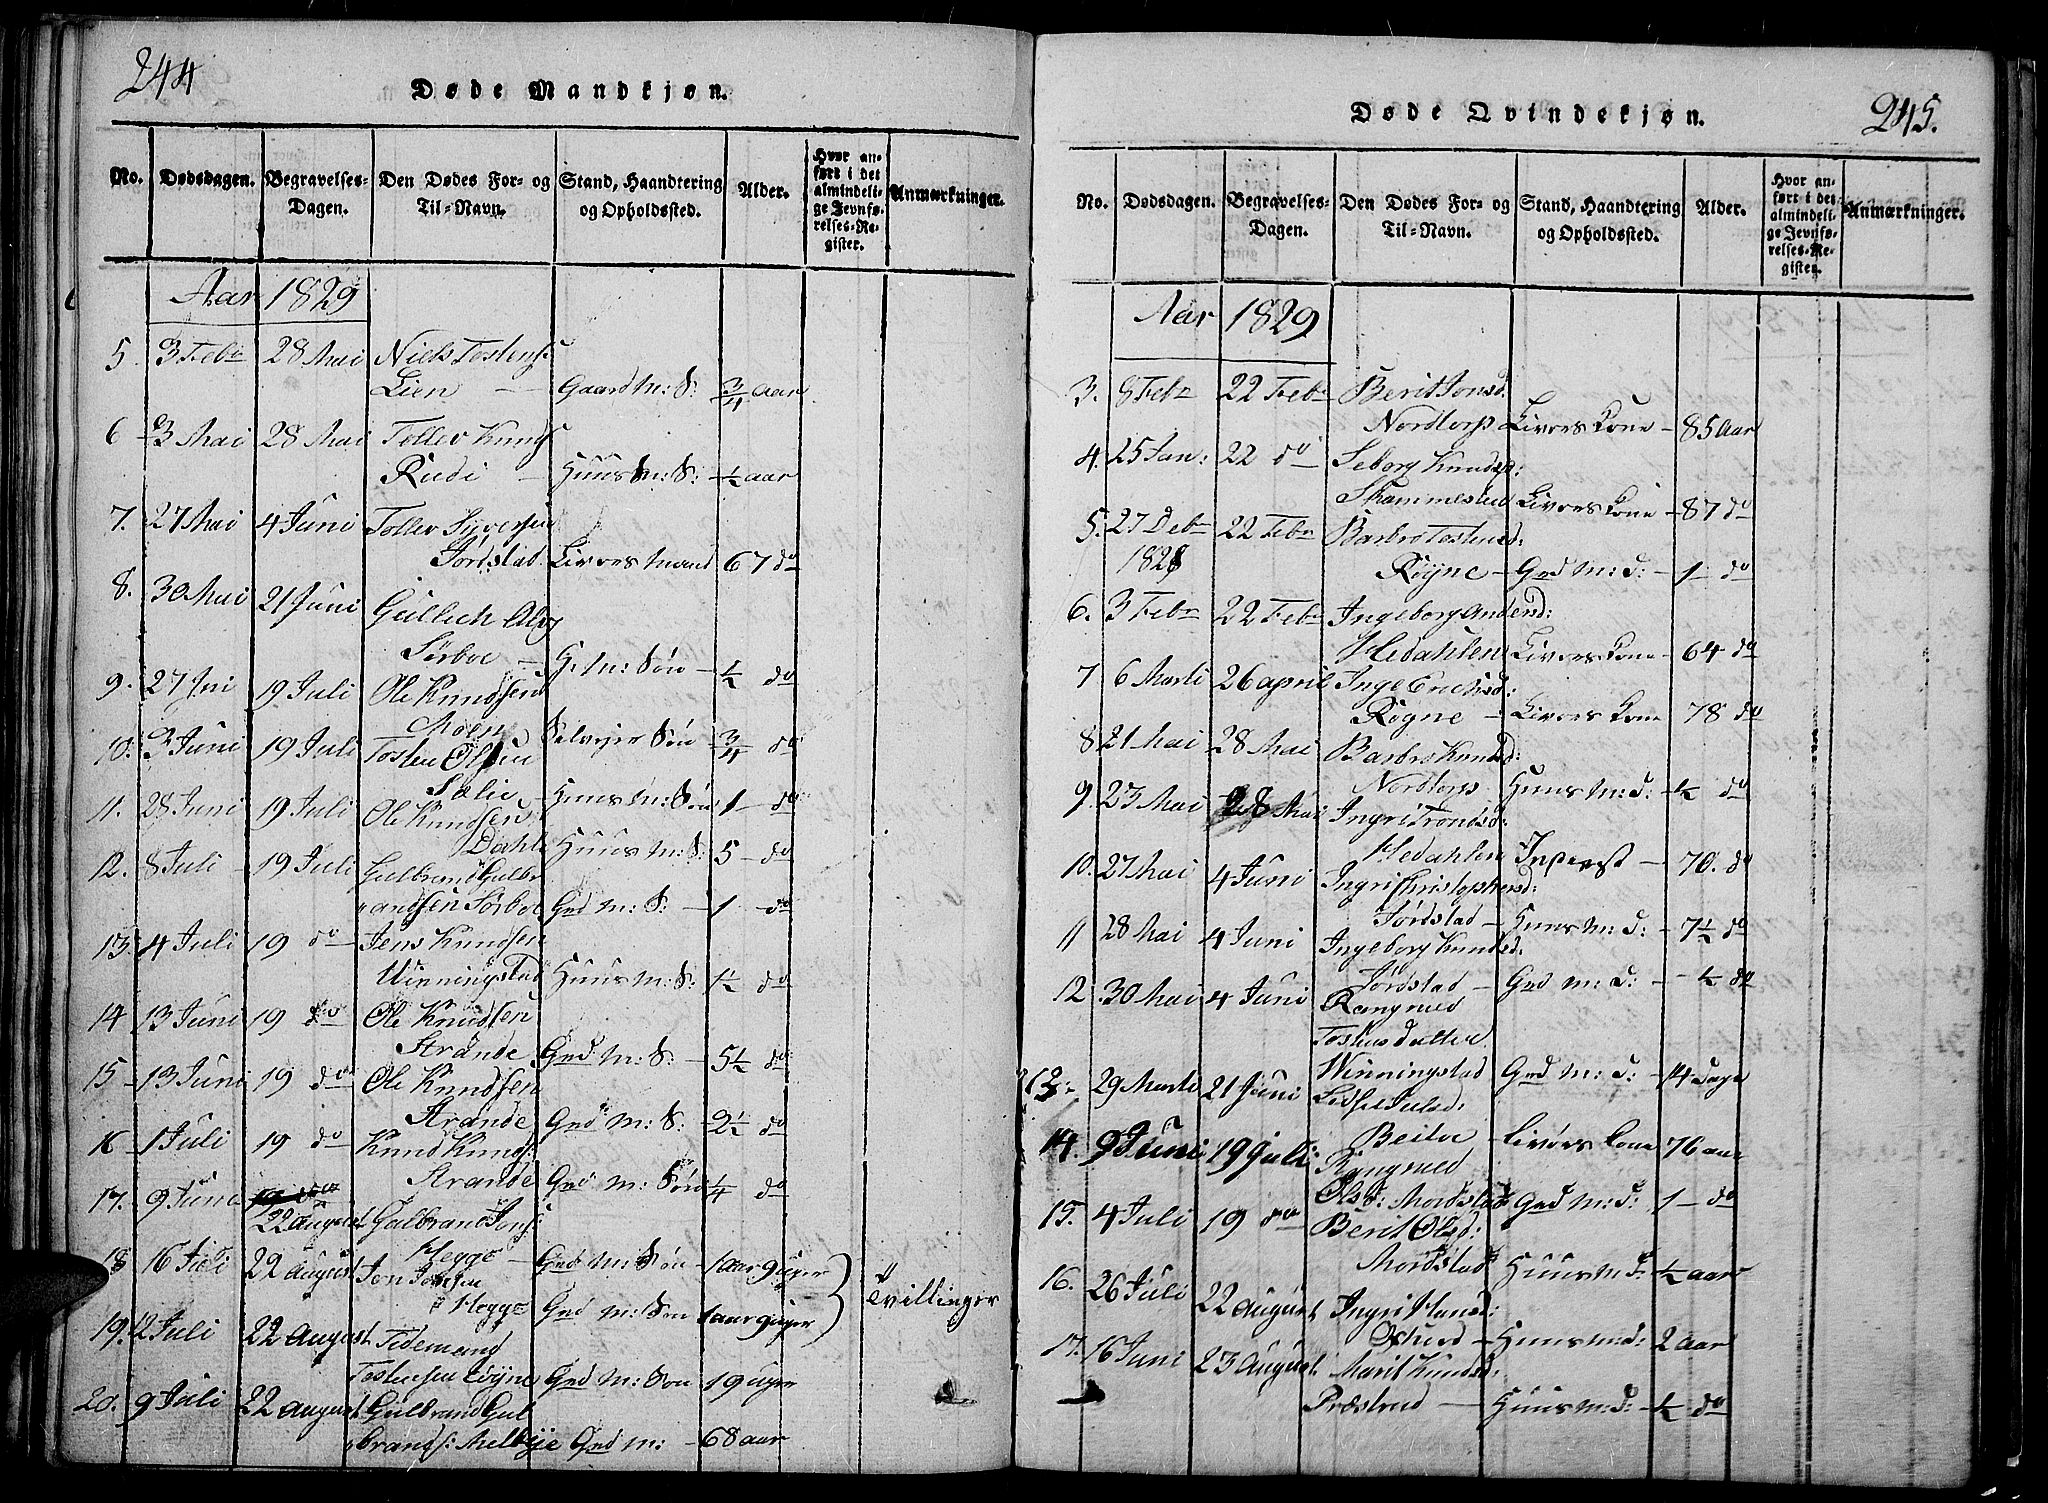 SAH, Slidre prestekontor, Klokkerbok nr. 2, 1814-1839, s. 244-245